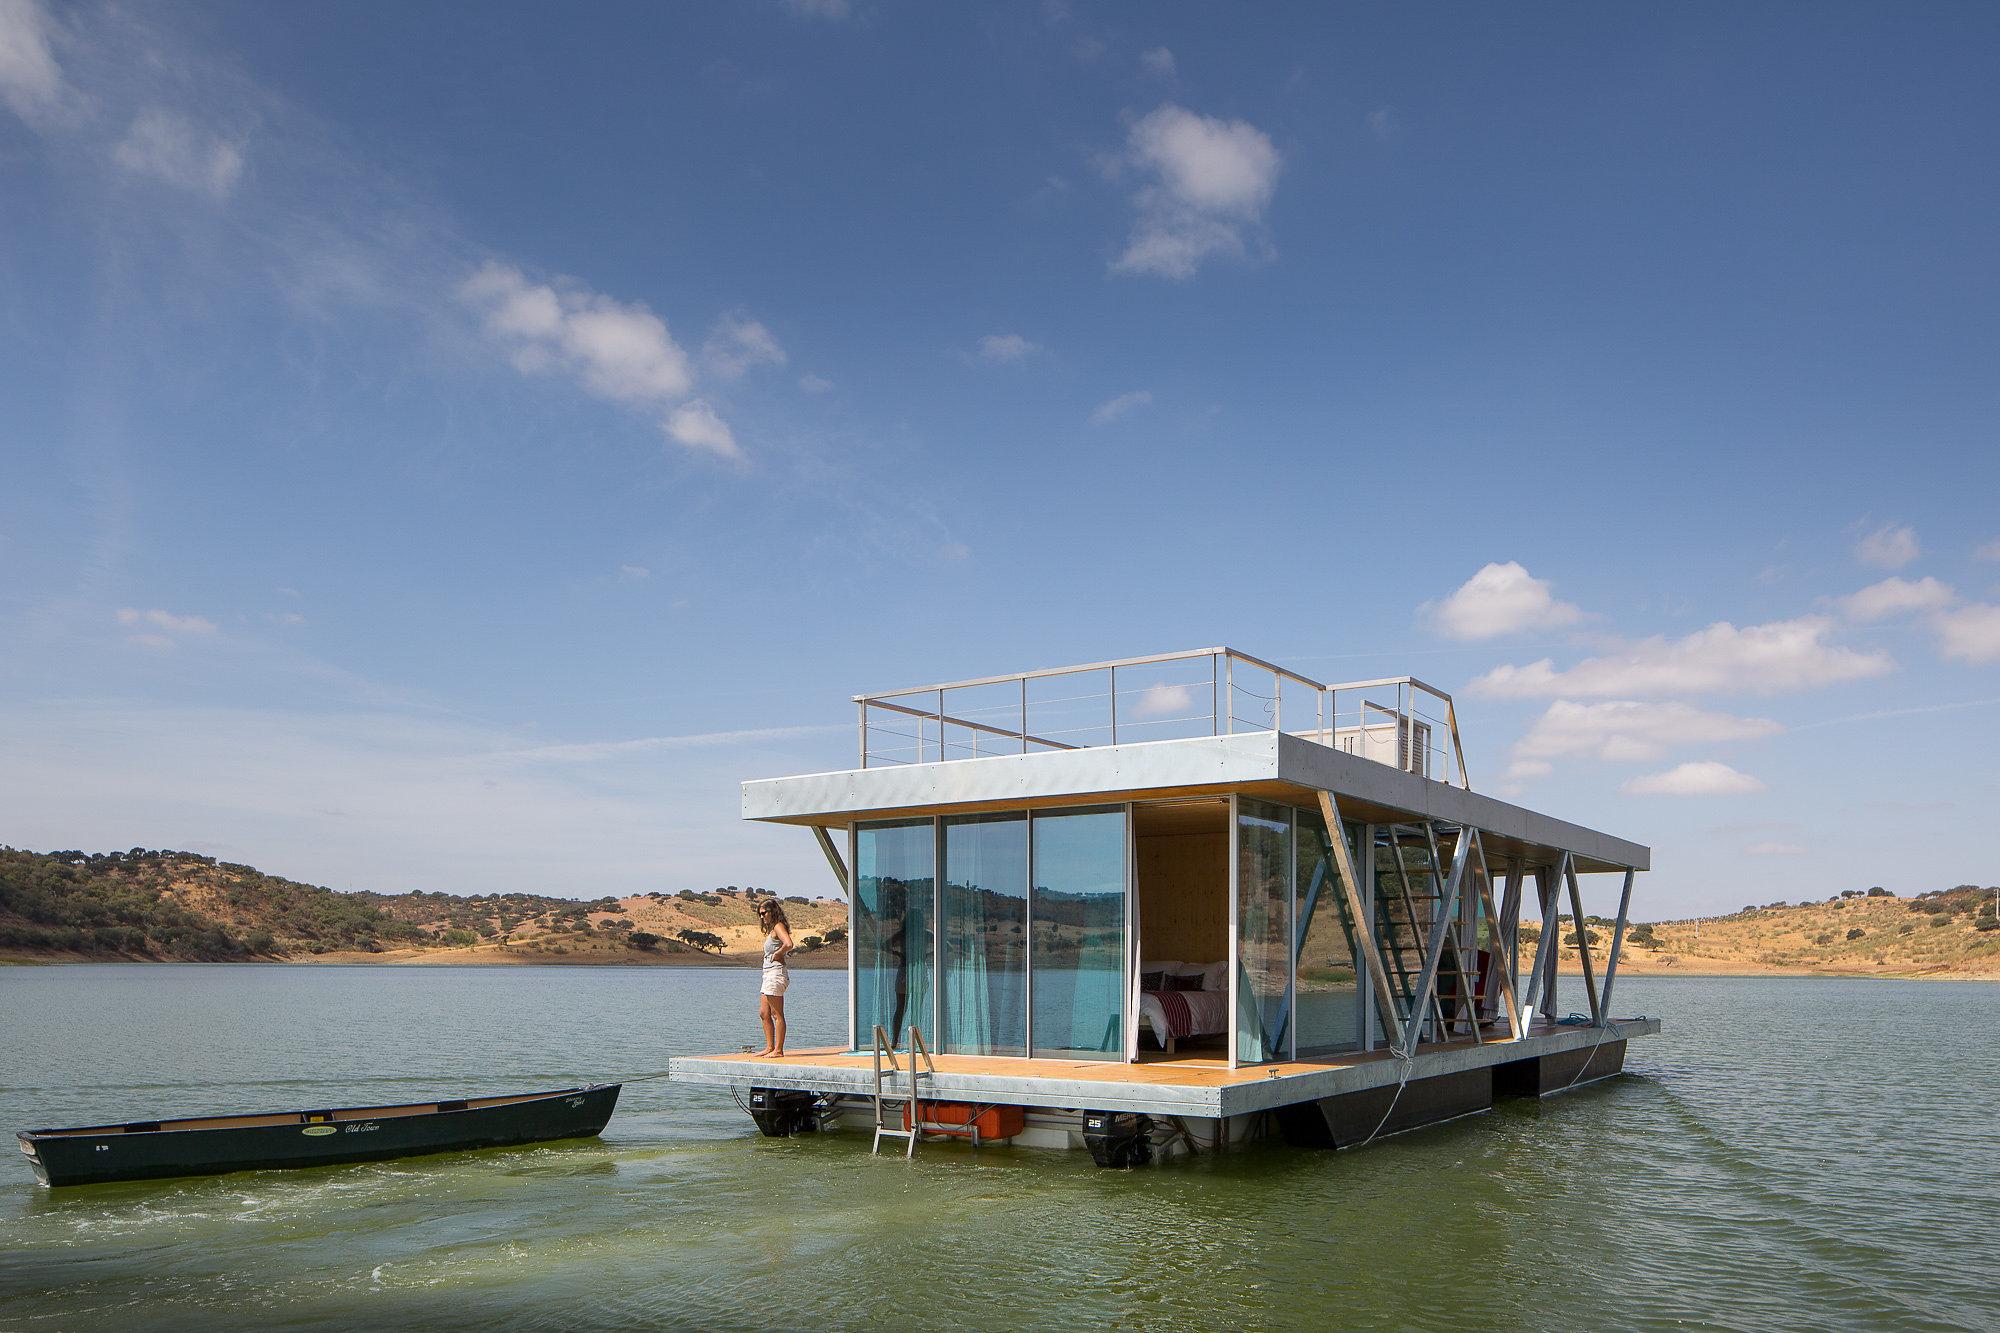 La casa flotante autosuficiente